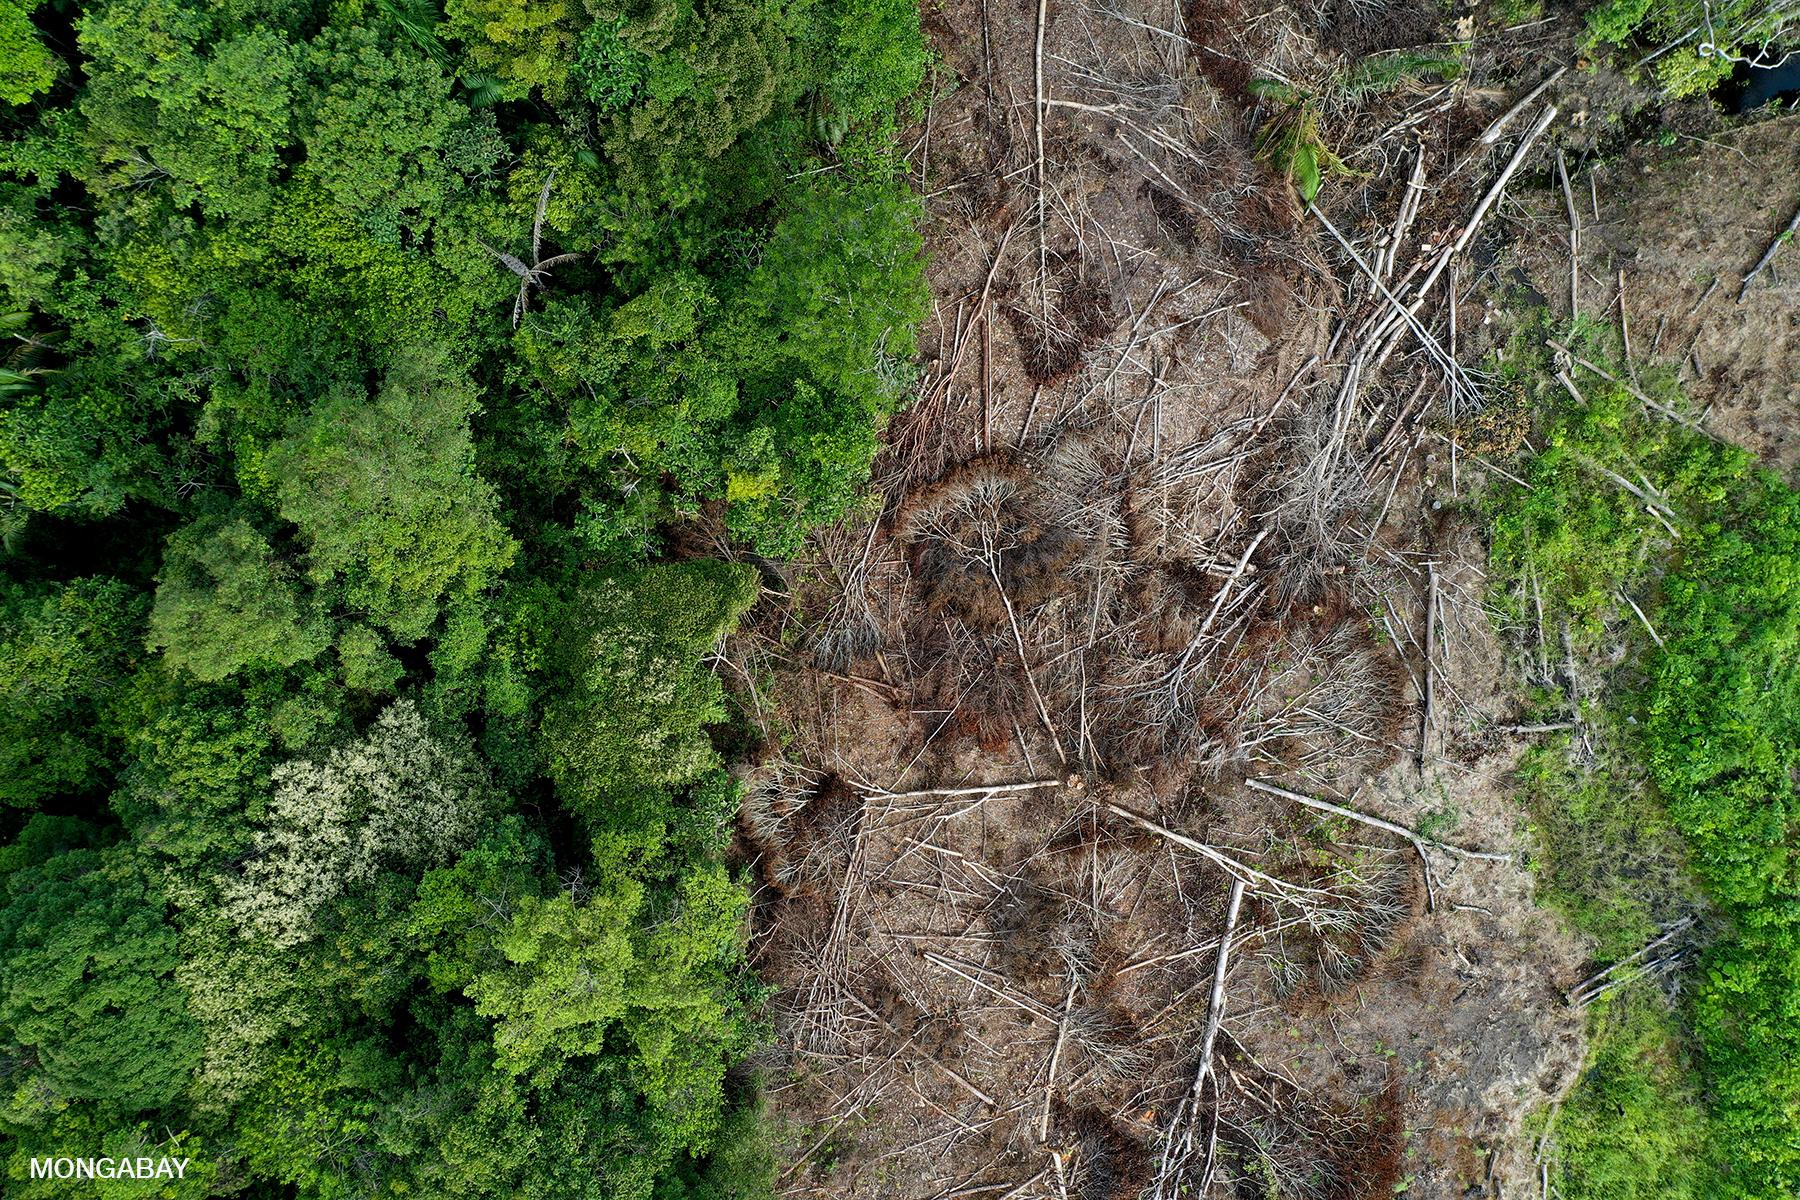 Deforestation in Kapuas Hulu, Indonesian Borneo. Photo by Rhett A. Butler.